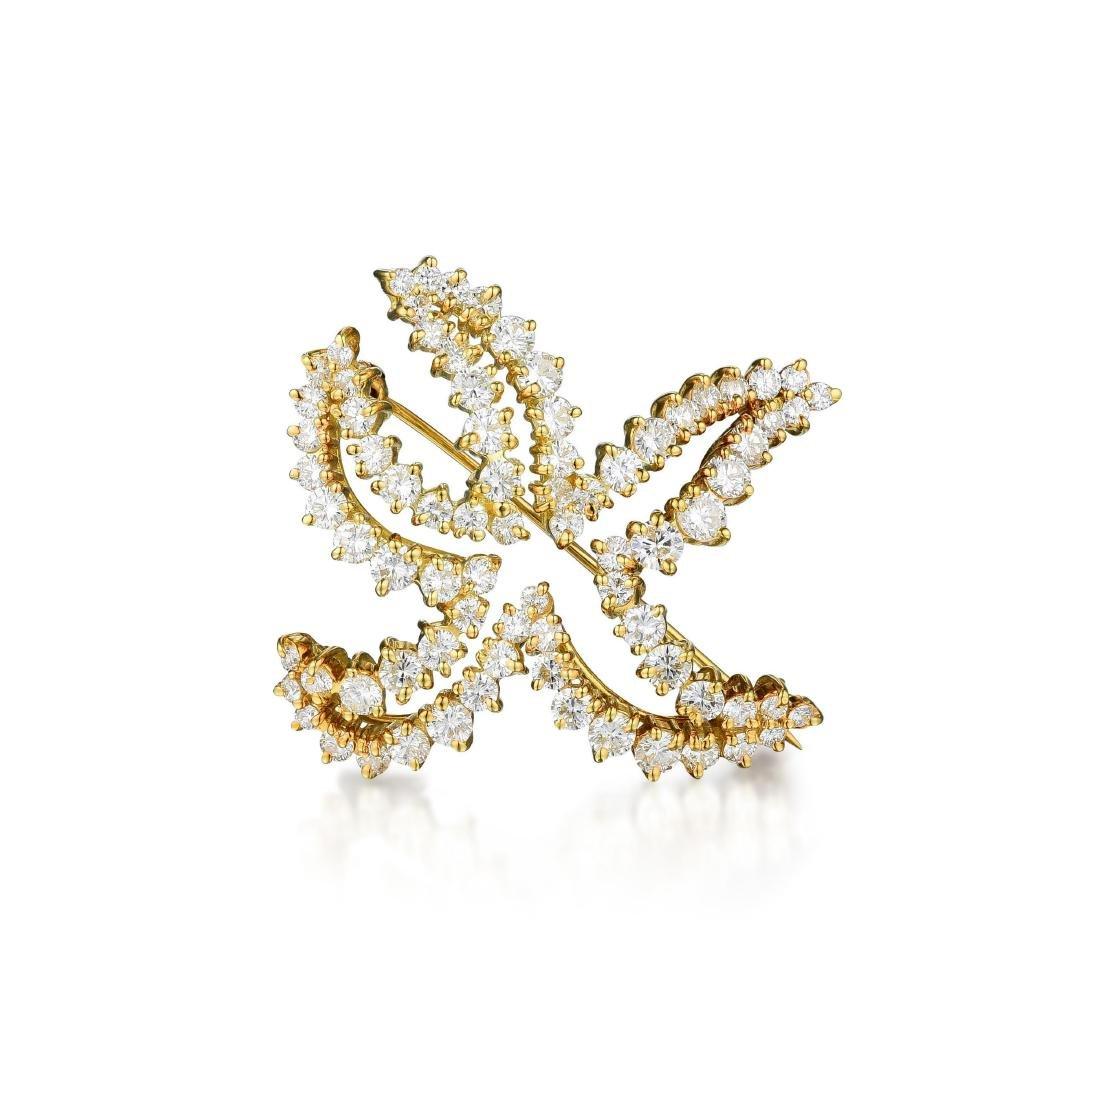 A 18K Gold Diamond Starfish Brooch